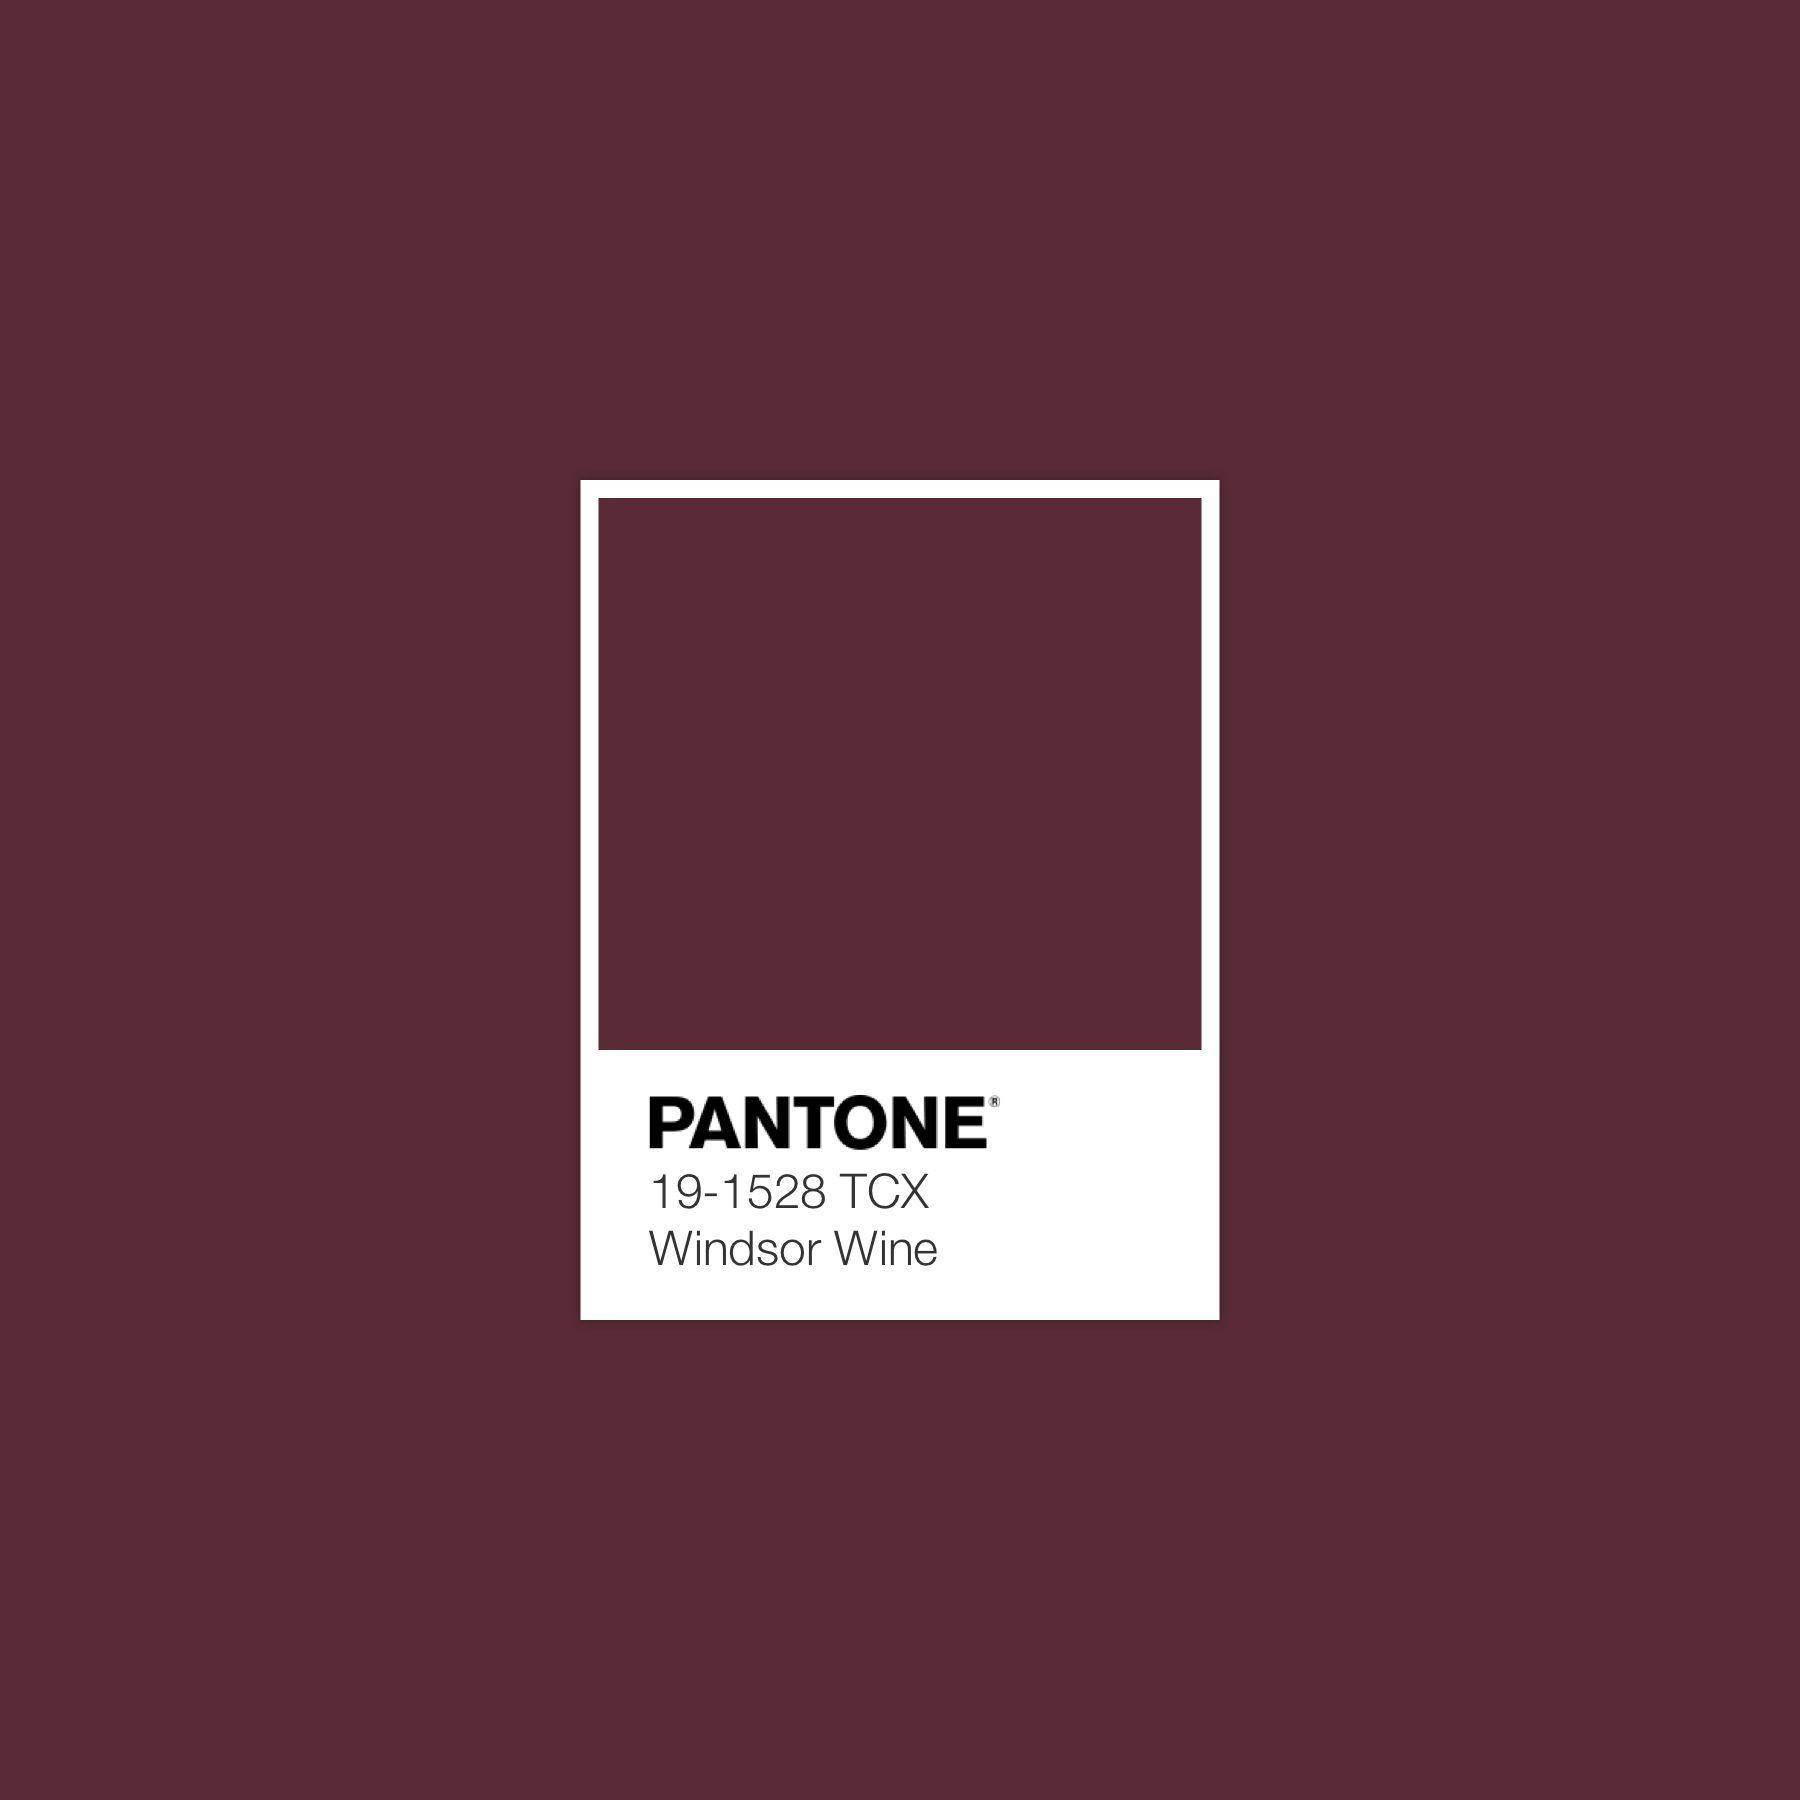 Windsor Wine Pantone Luxurydotcom Inspiracao De Cores Paleta De Cores Combinacoes De Cores